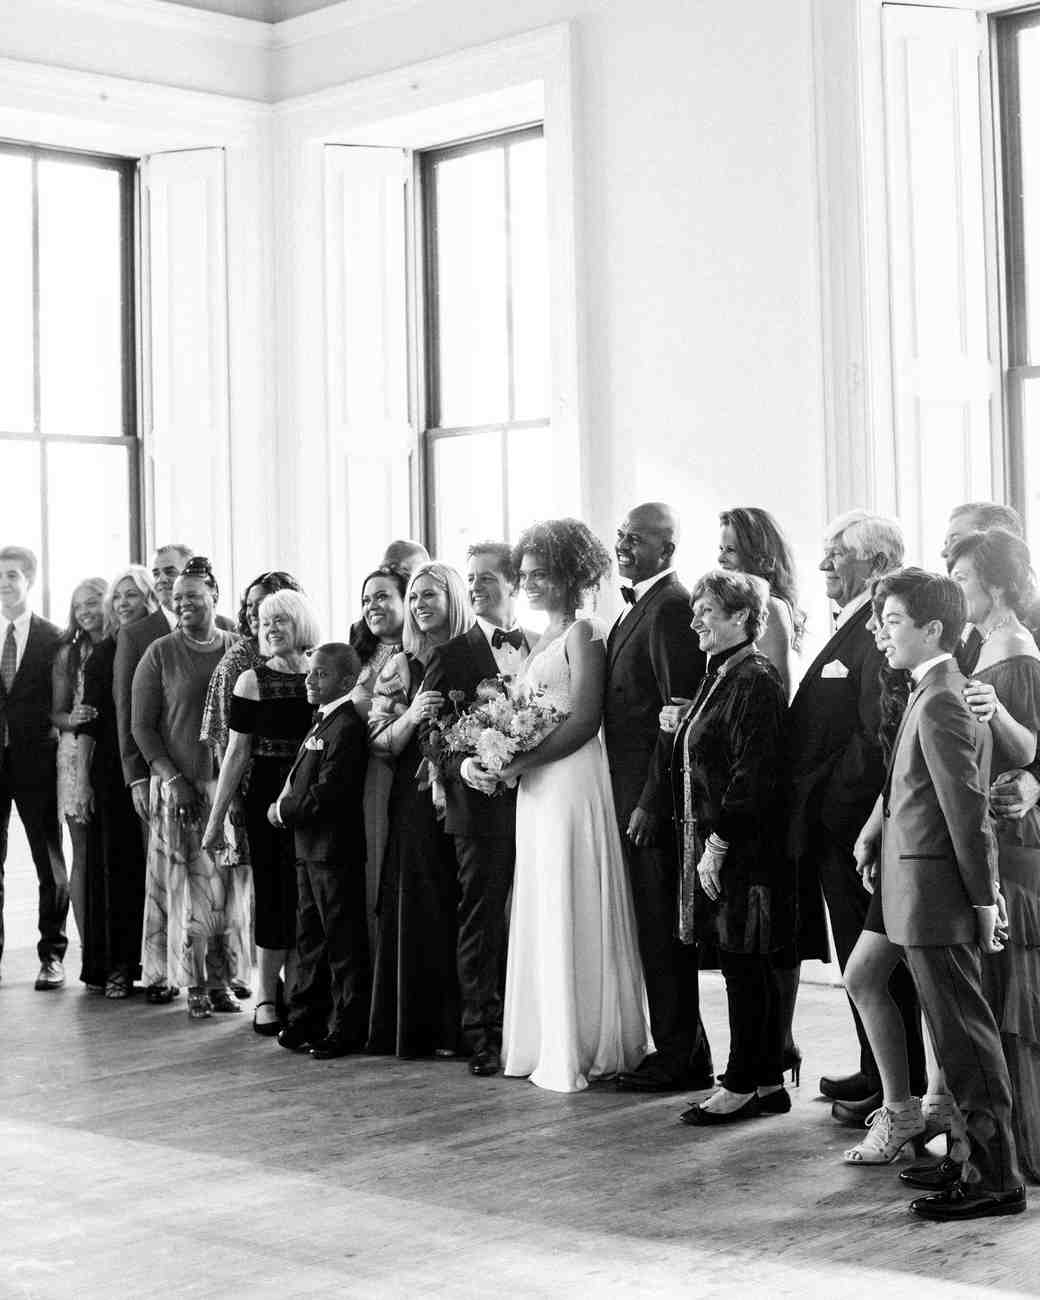 natalie louis wedding group photo